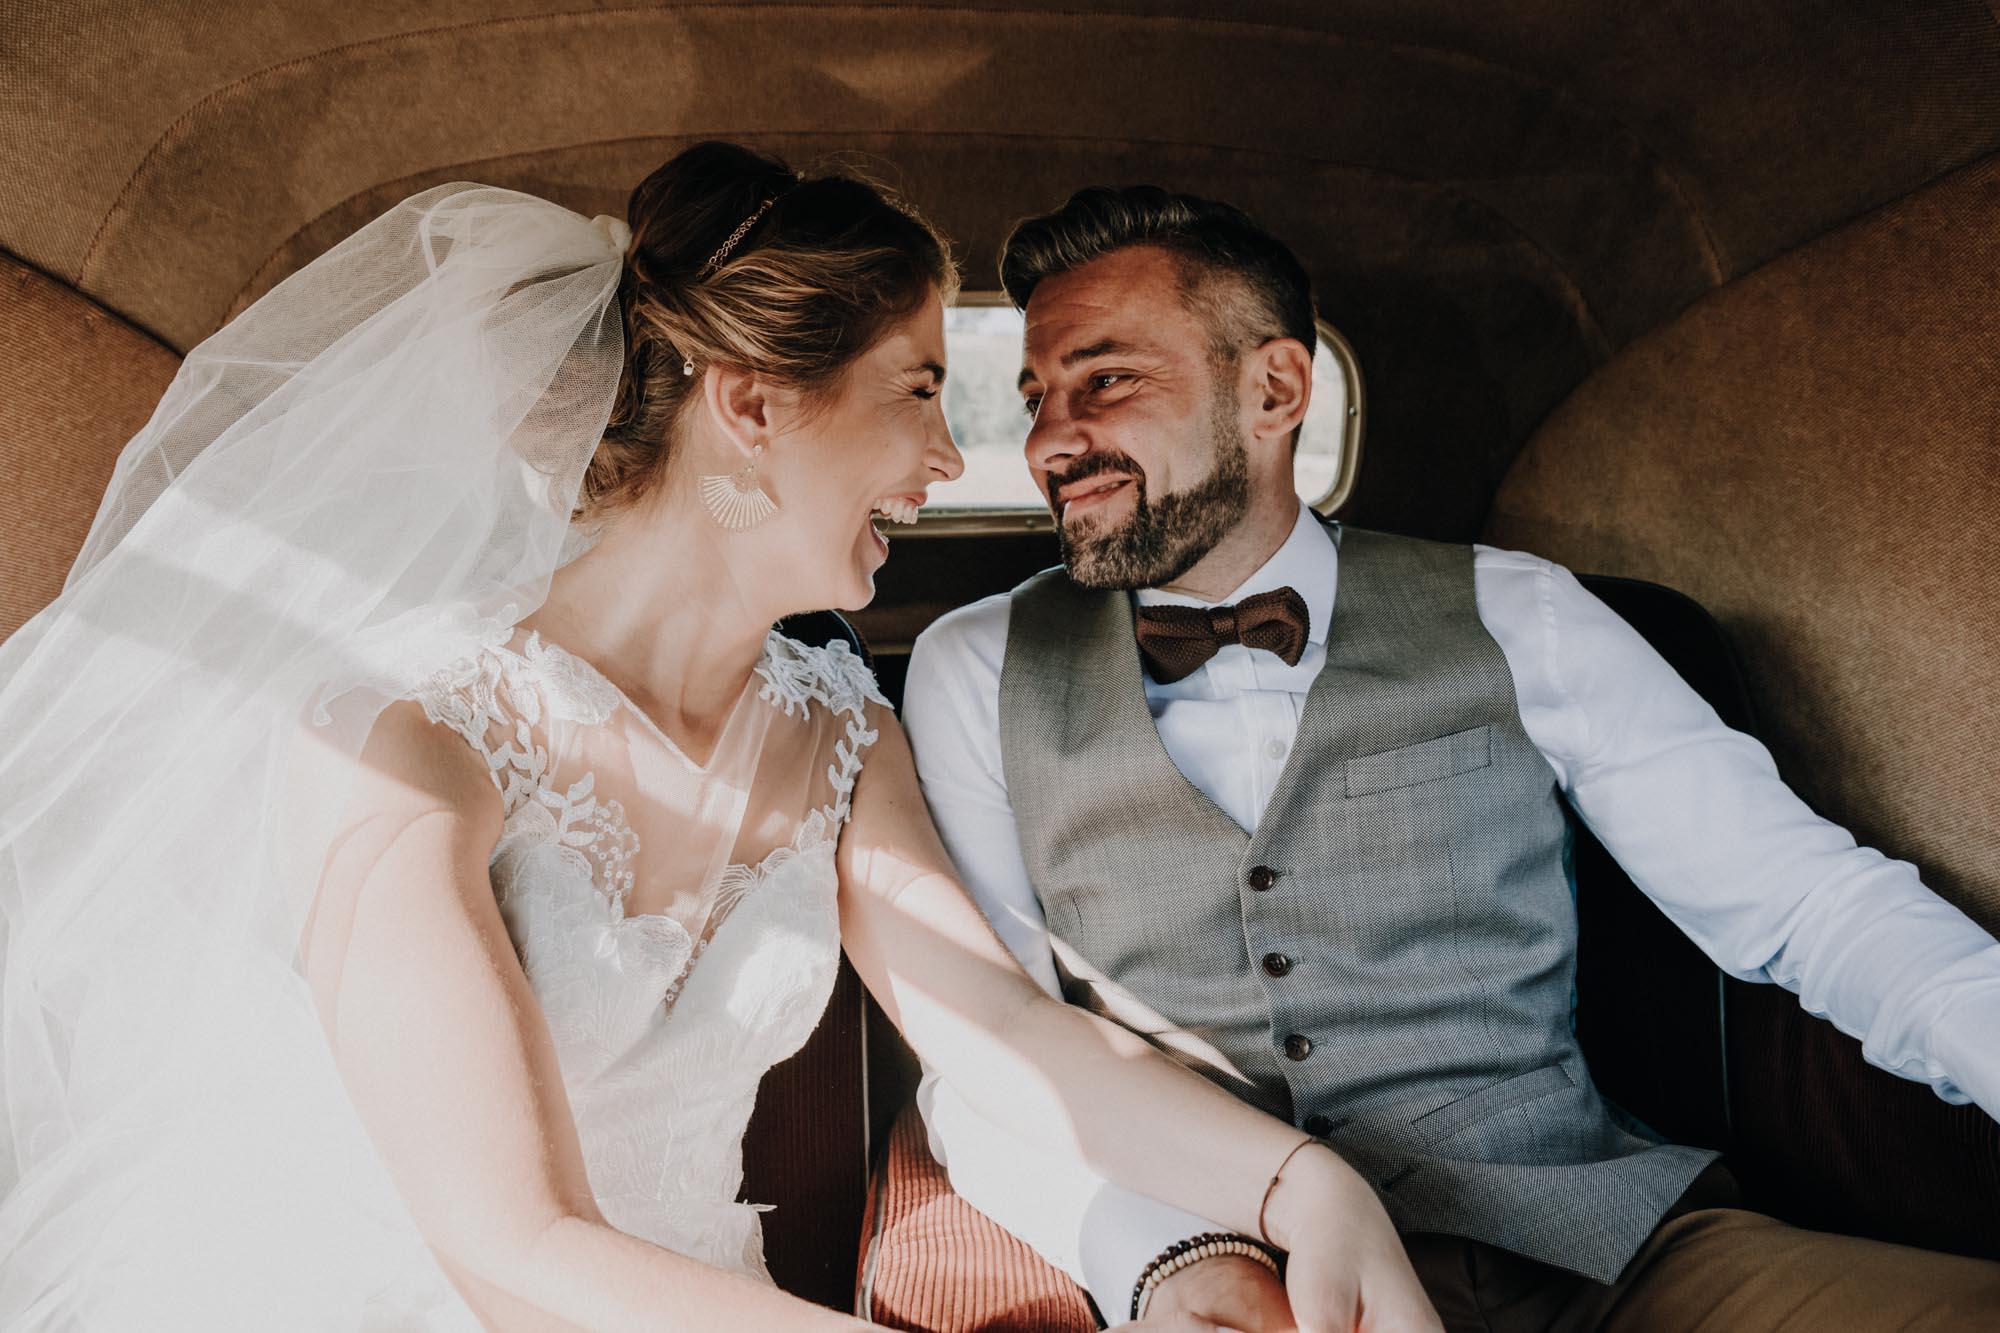 2018-09-29 - LD8_1129 - photographe mariage lyon - laurie diaz - www.lauriediazweeding.com.jpg